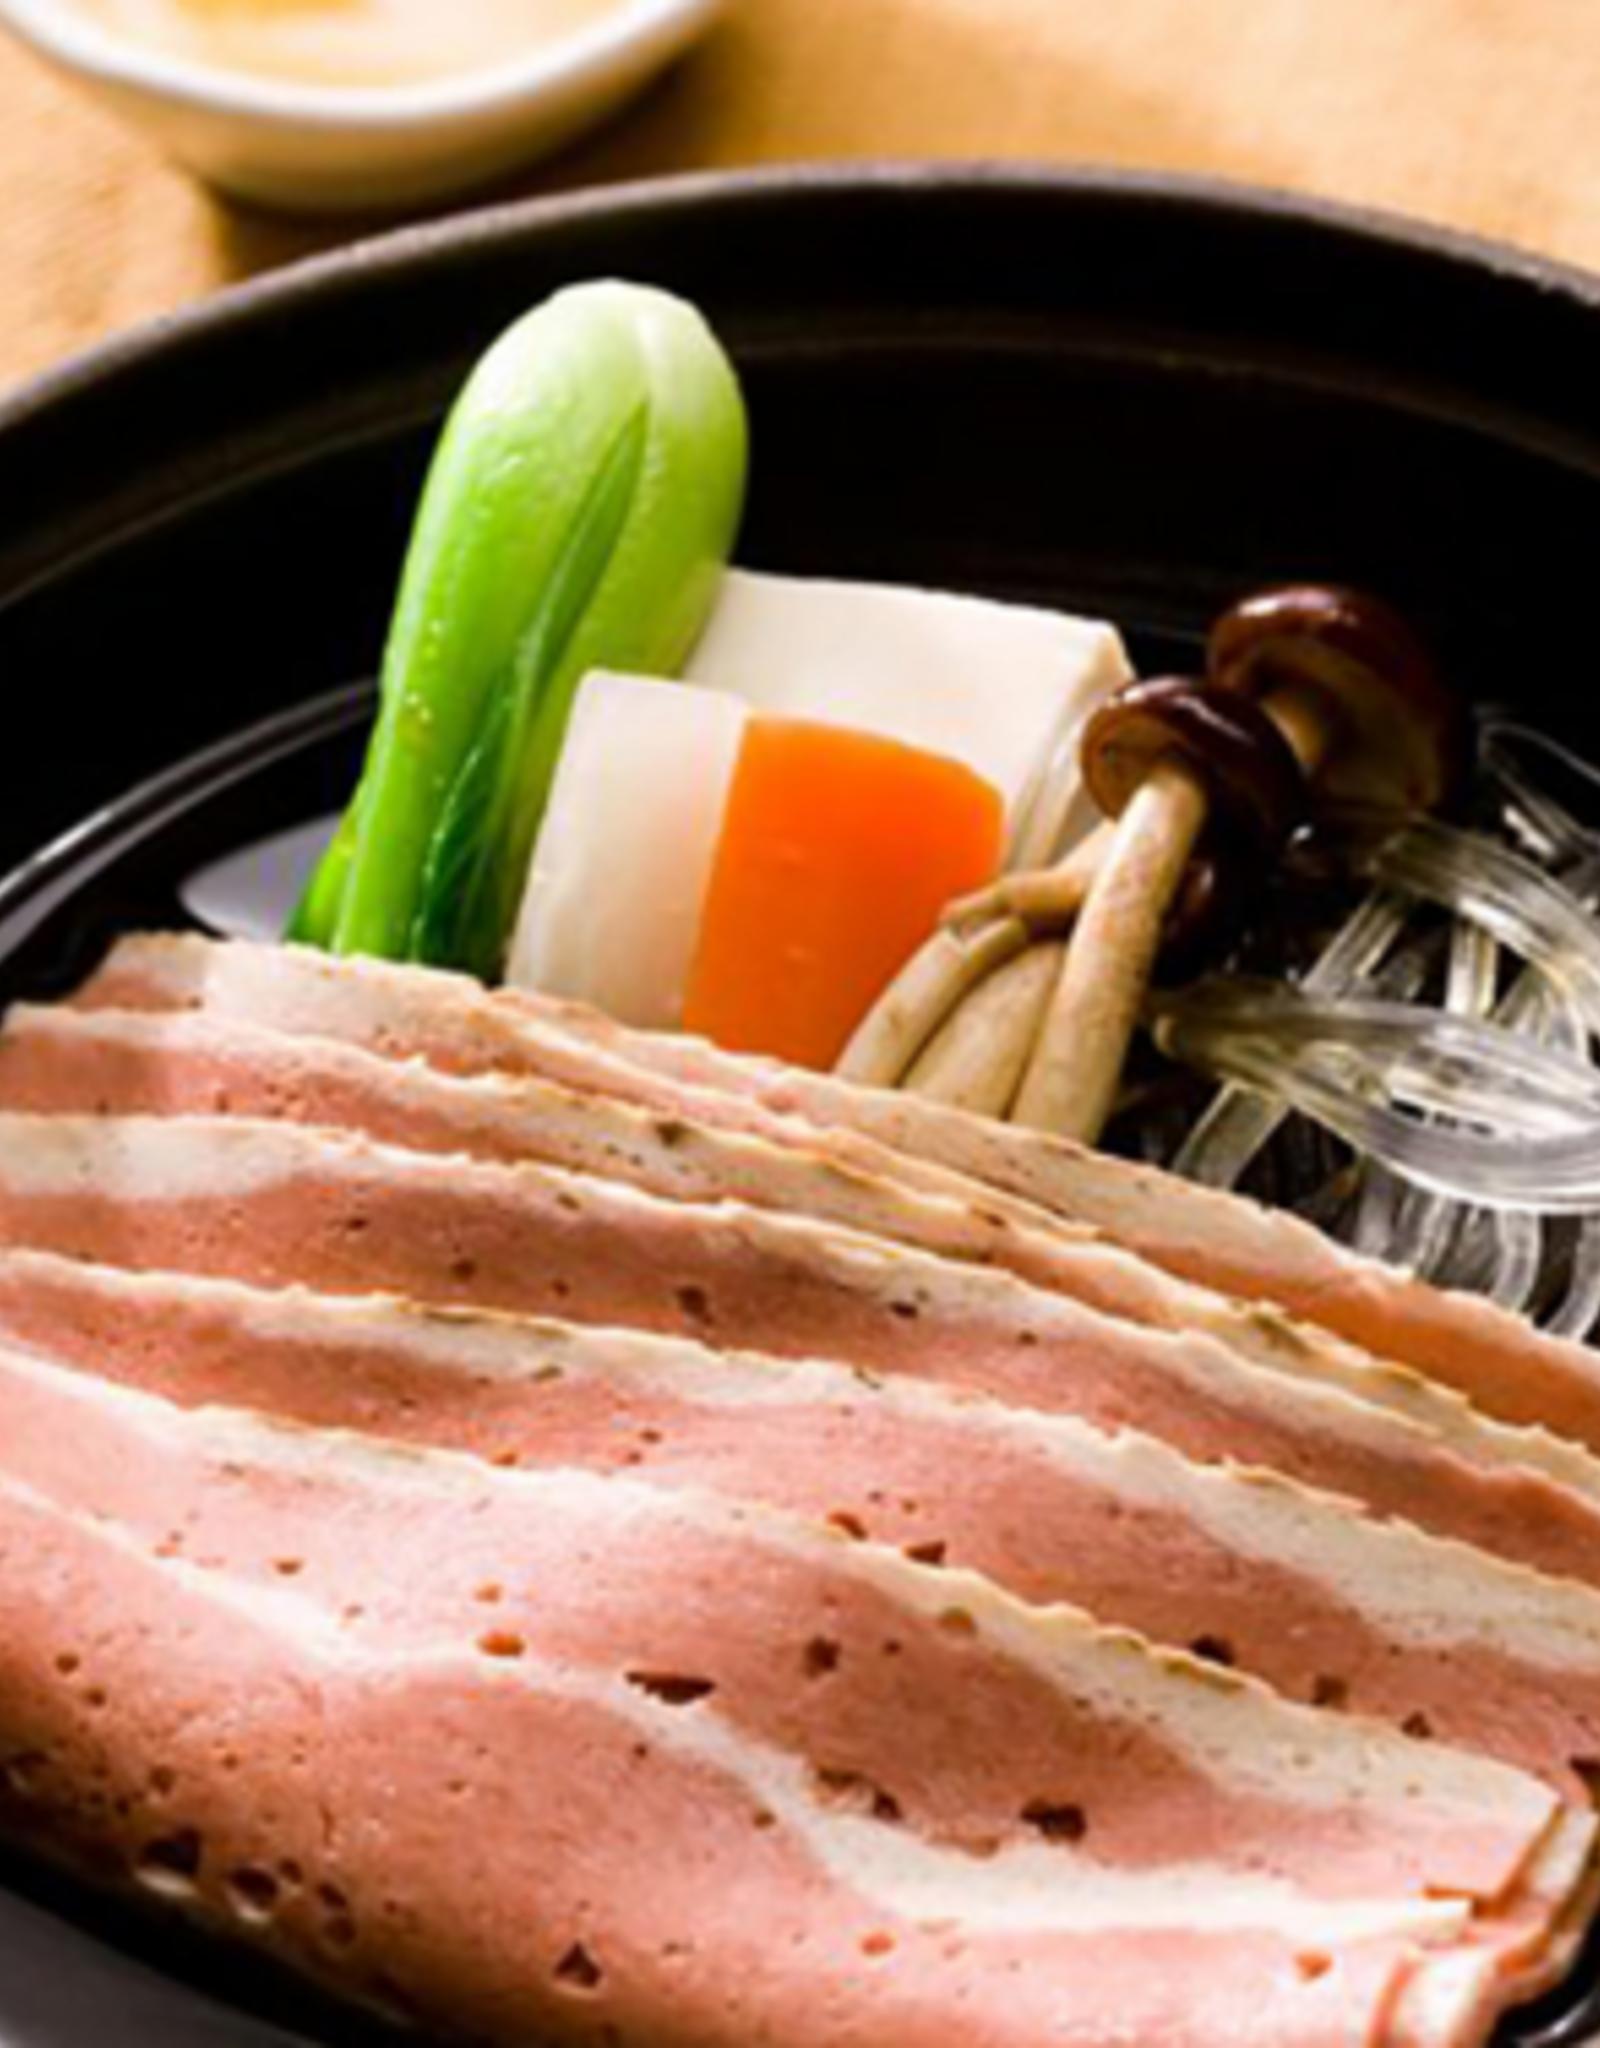 Vegefarm * 松珍 (VF) Vegan  Bacon Slices*(松珍) 無奶蛋培根片